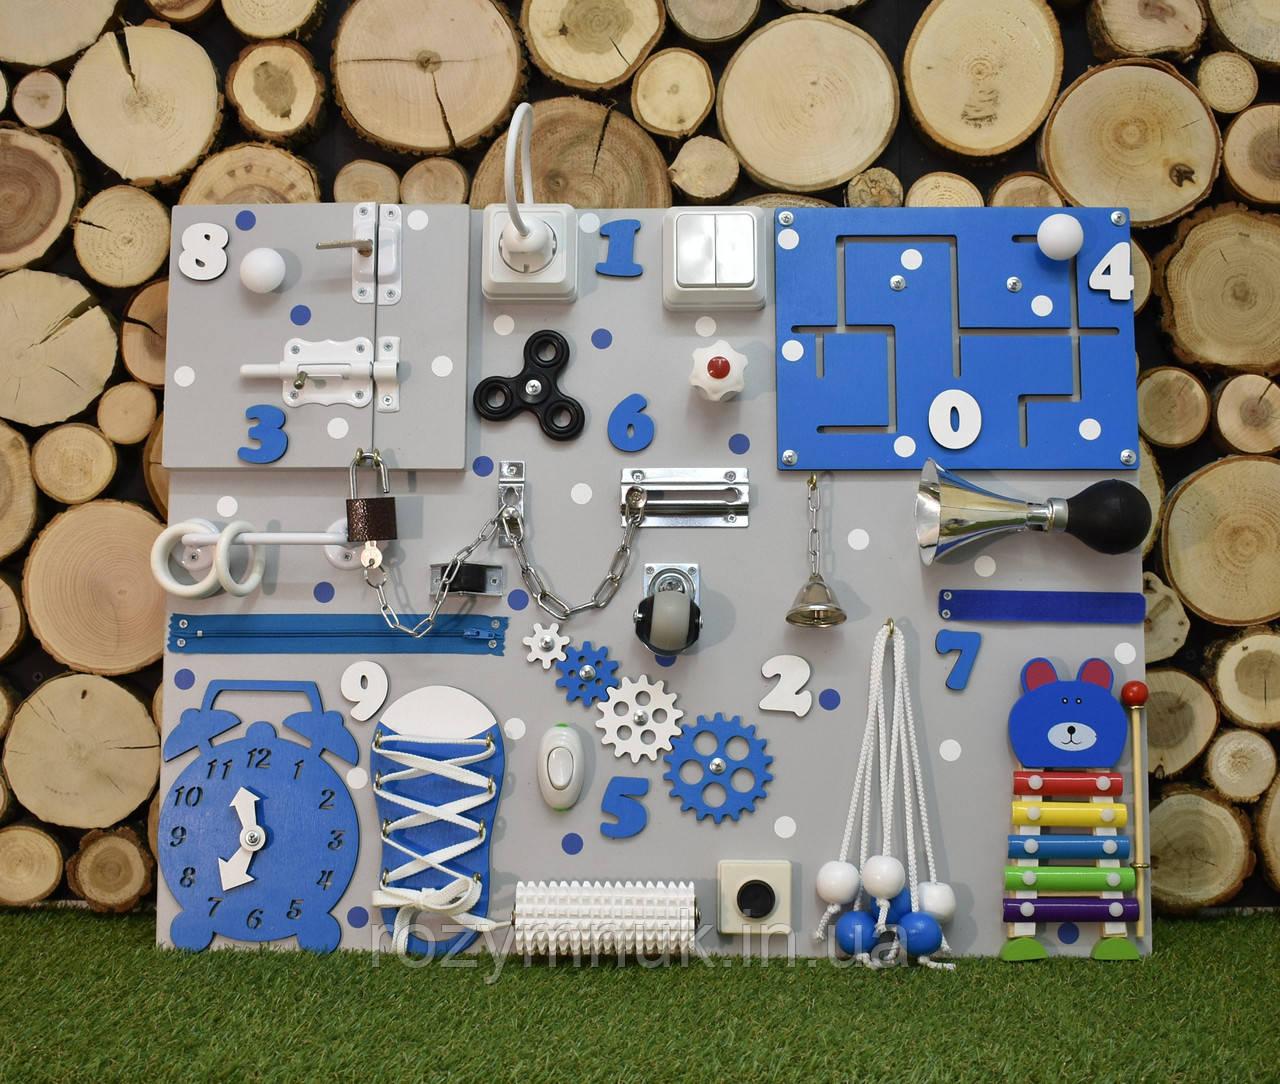 Развивающая доска Бизиборд размер 50*65 Бізіборд busyboard синего цвета для мальчика